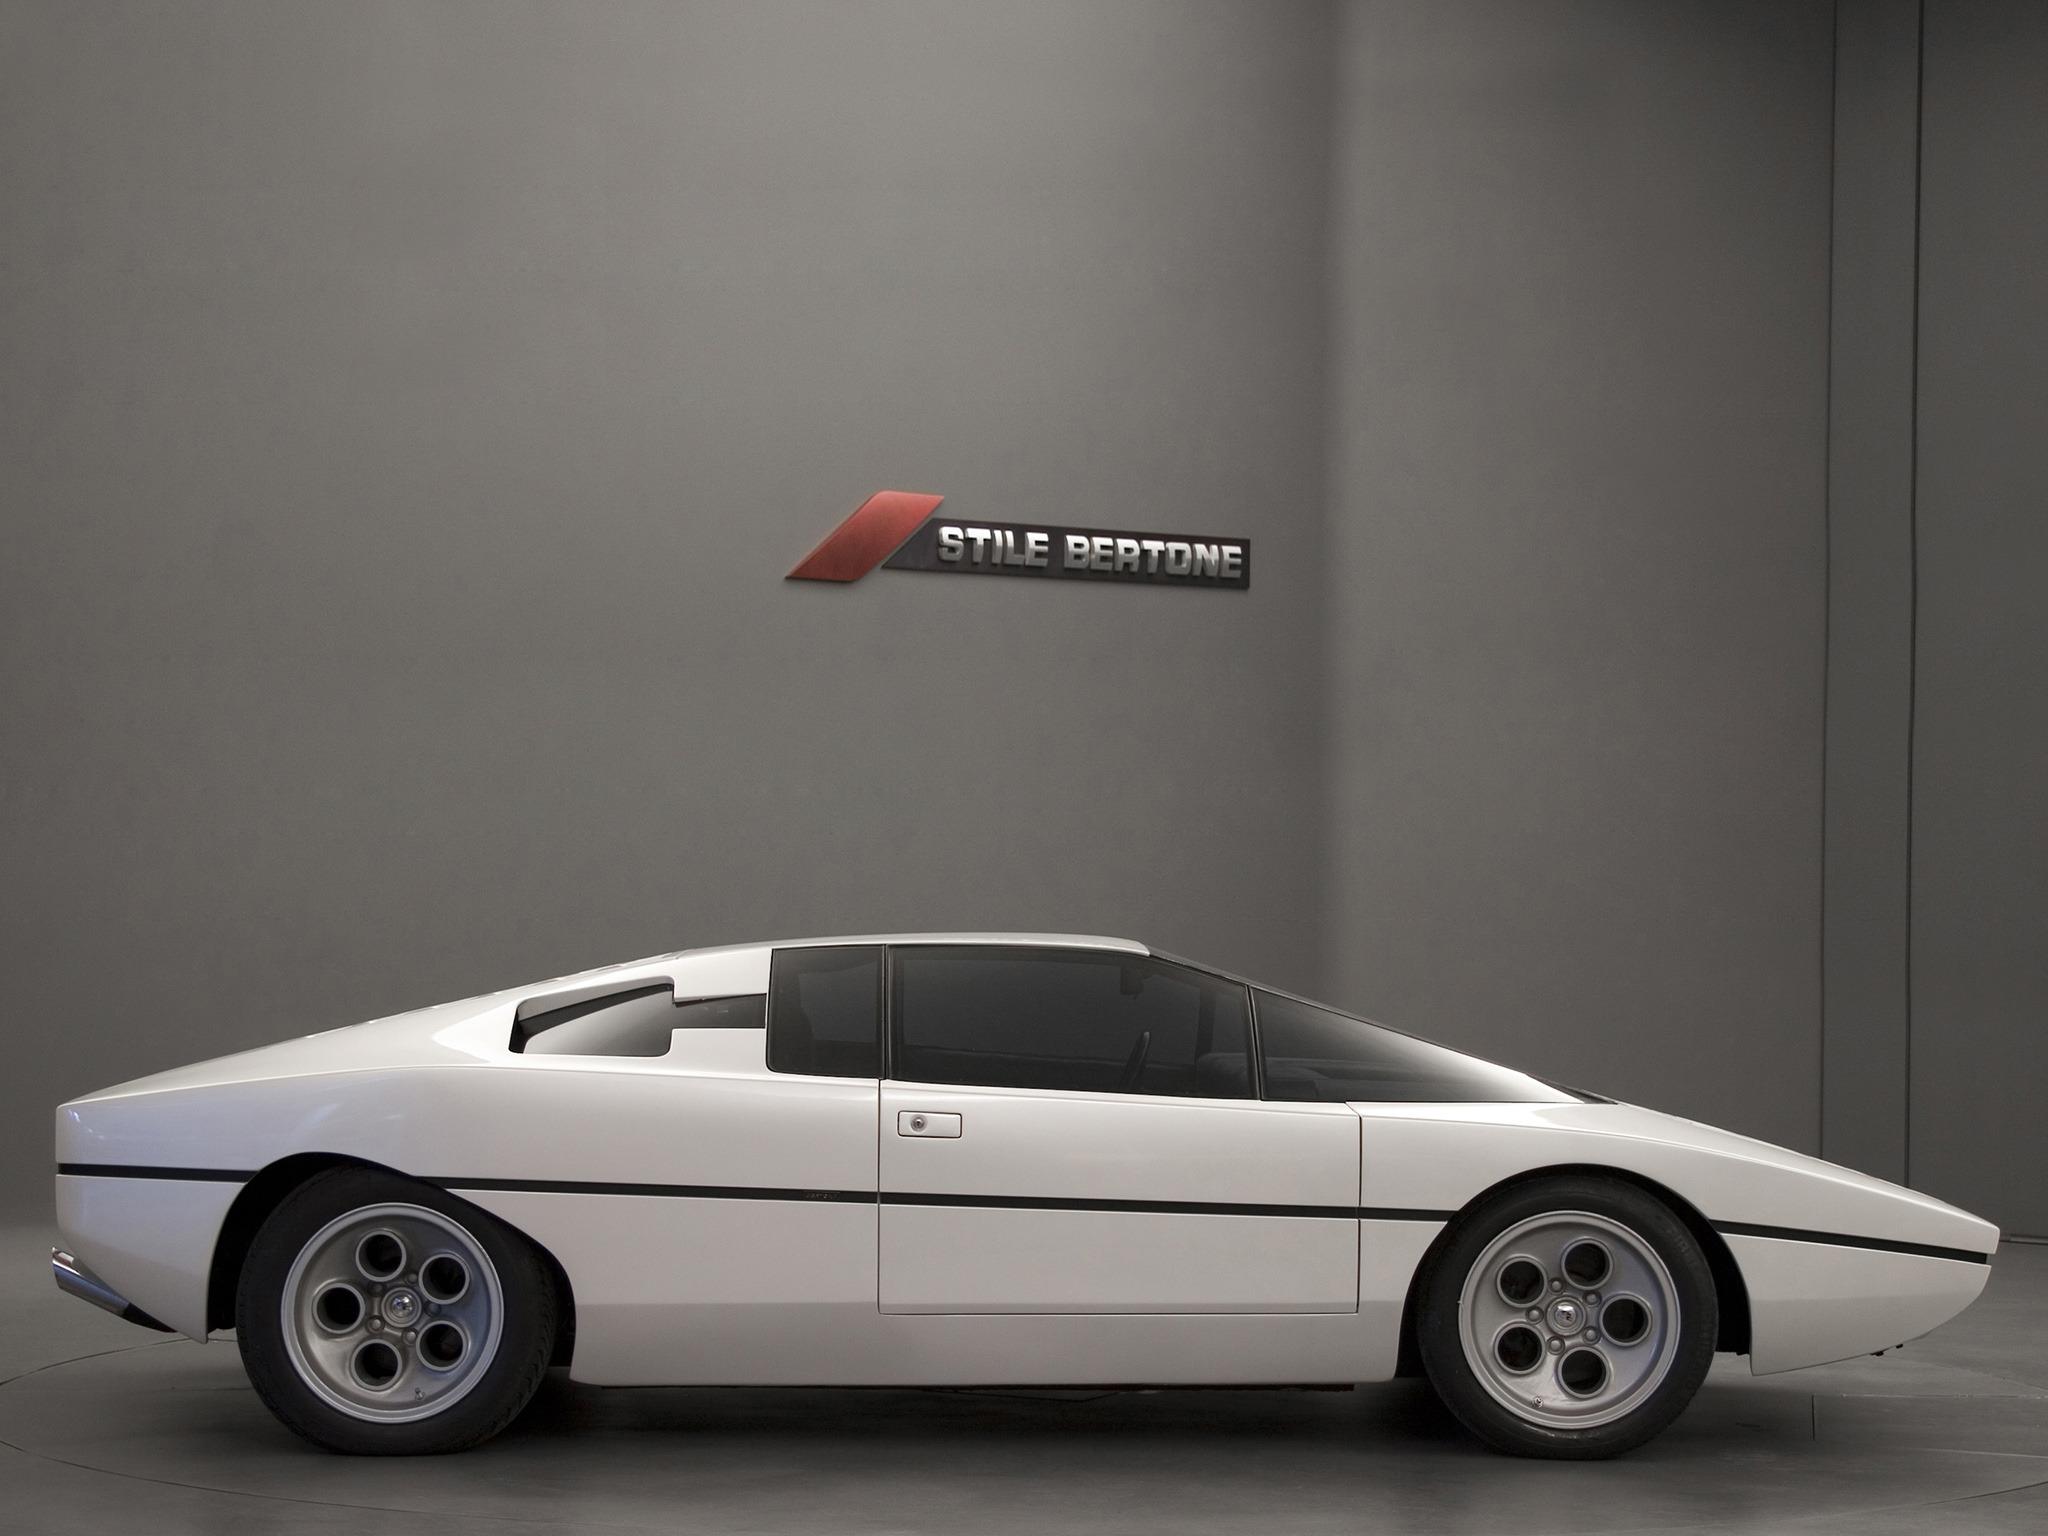 Latest Sports Cars 2014 Wallpaper Lamborghini Bravo 1974 Old Concept Cars